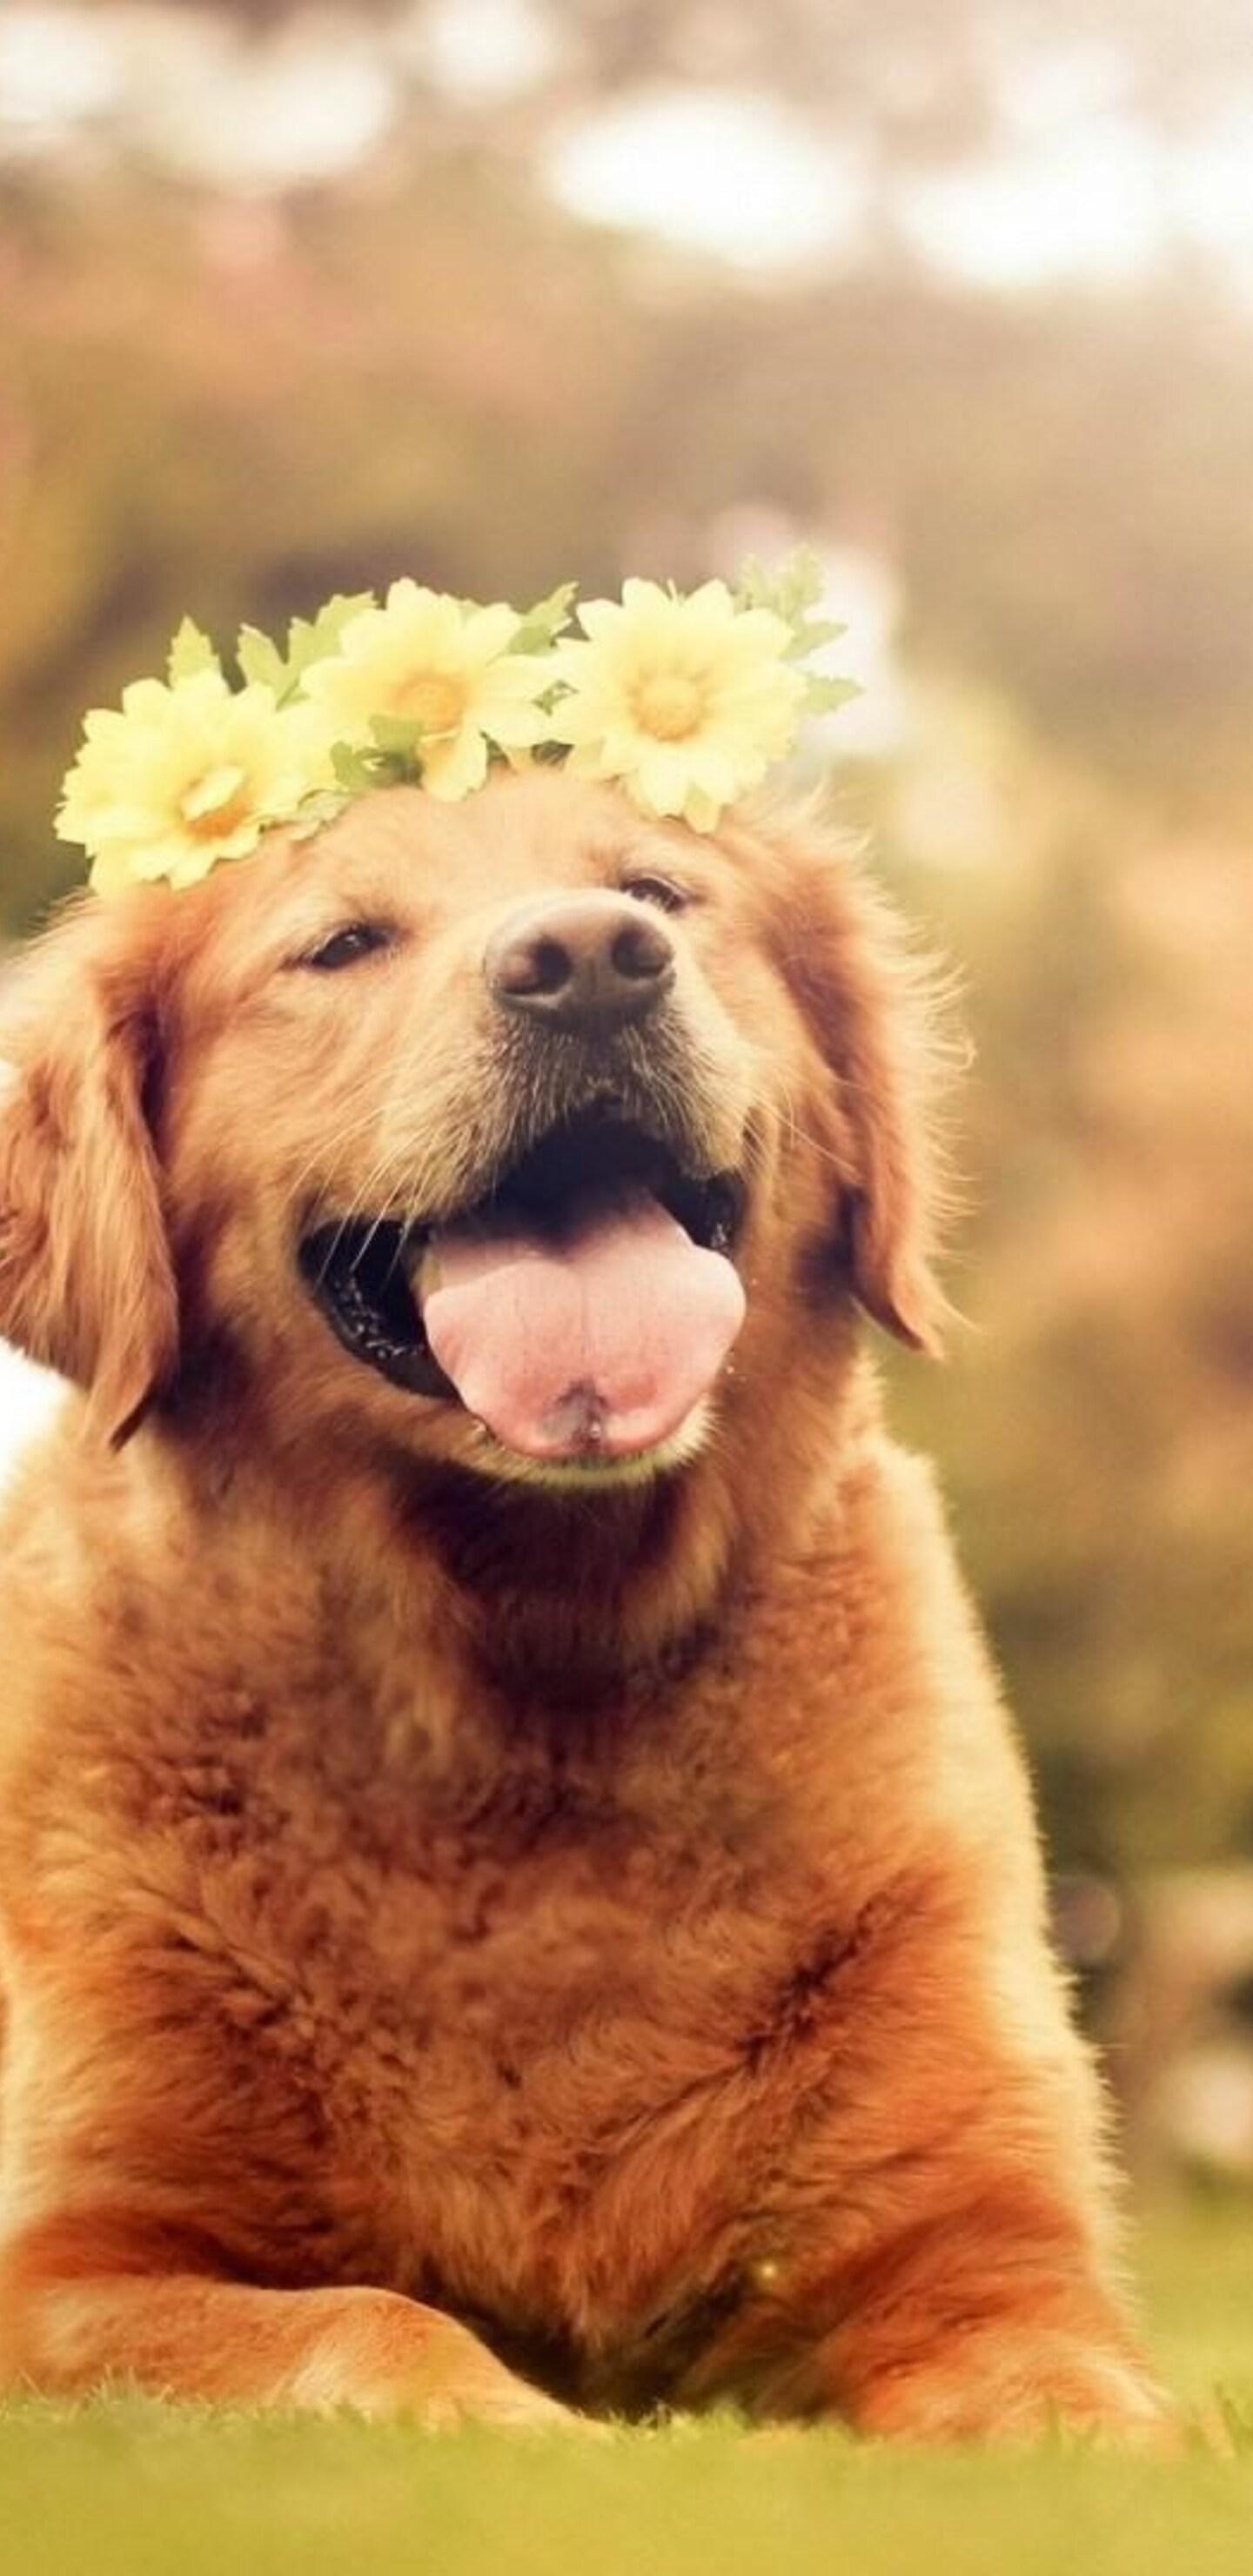 dog flowers smiling wallpaper